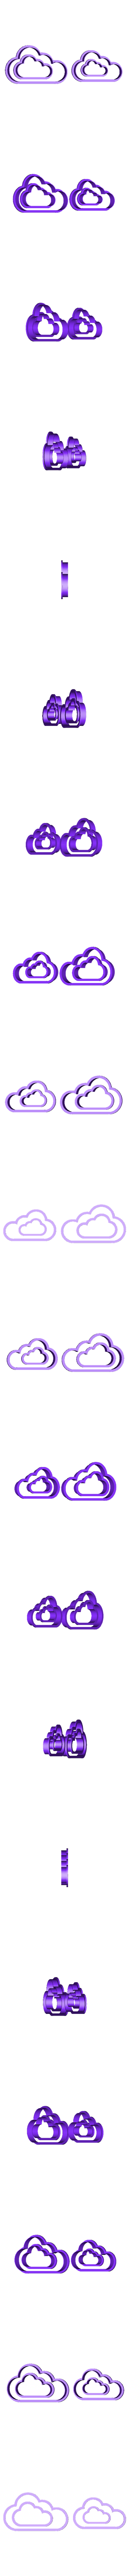 930 Nubes set.stl Download STL file Cloud cutter set • 3D printing model, juanchininaiara